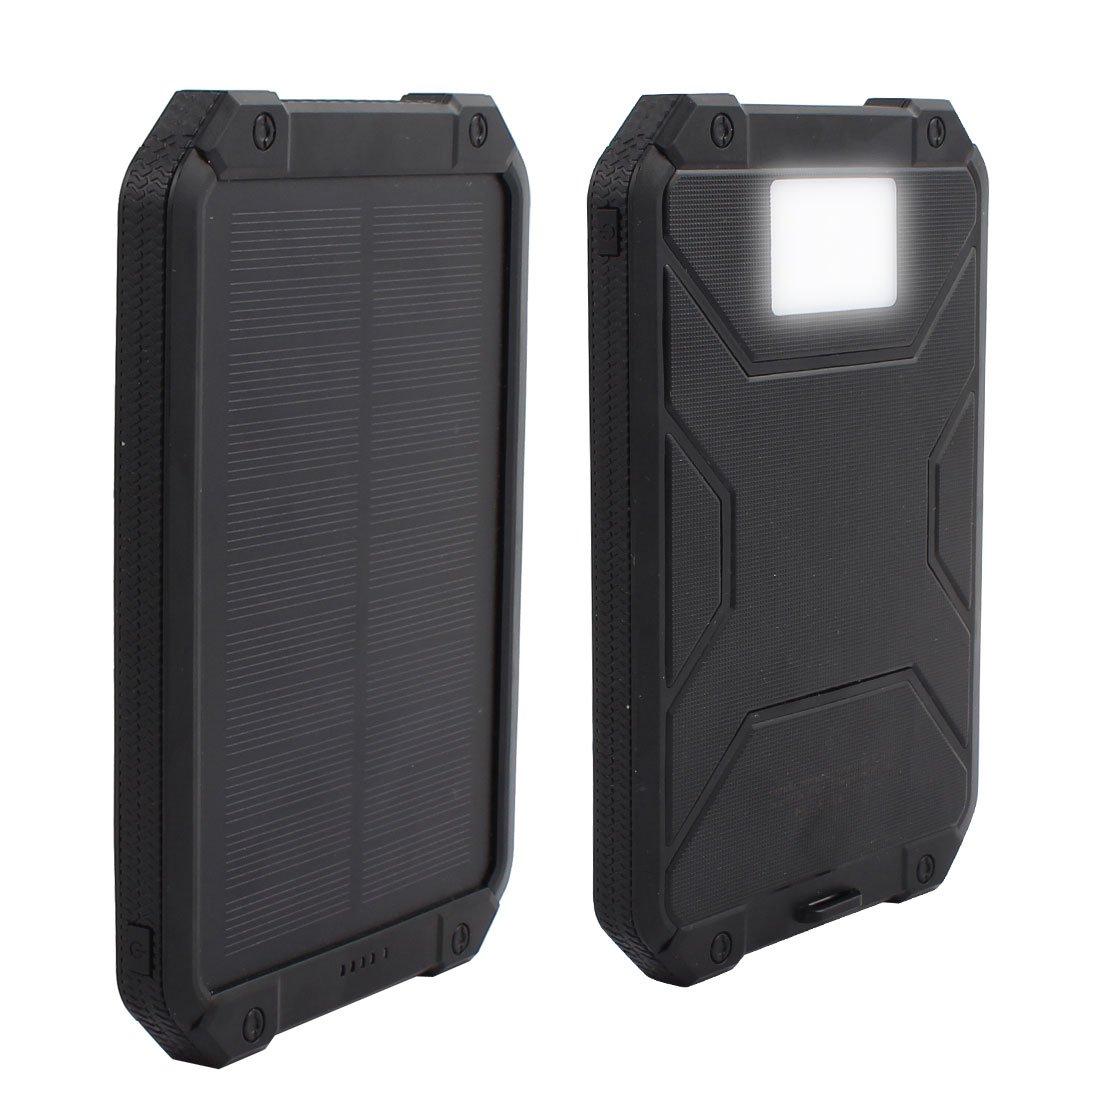 X-Dr Solar Charger, 10000mAh Dual USB Power Bank Portable ...